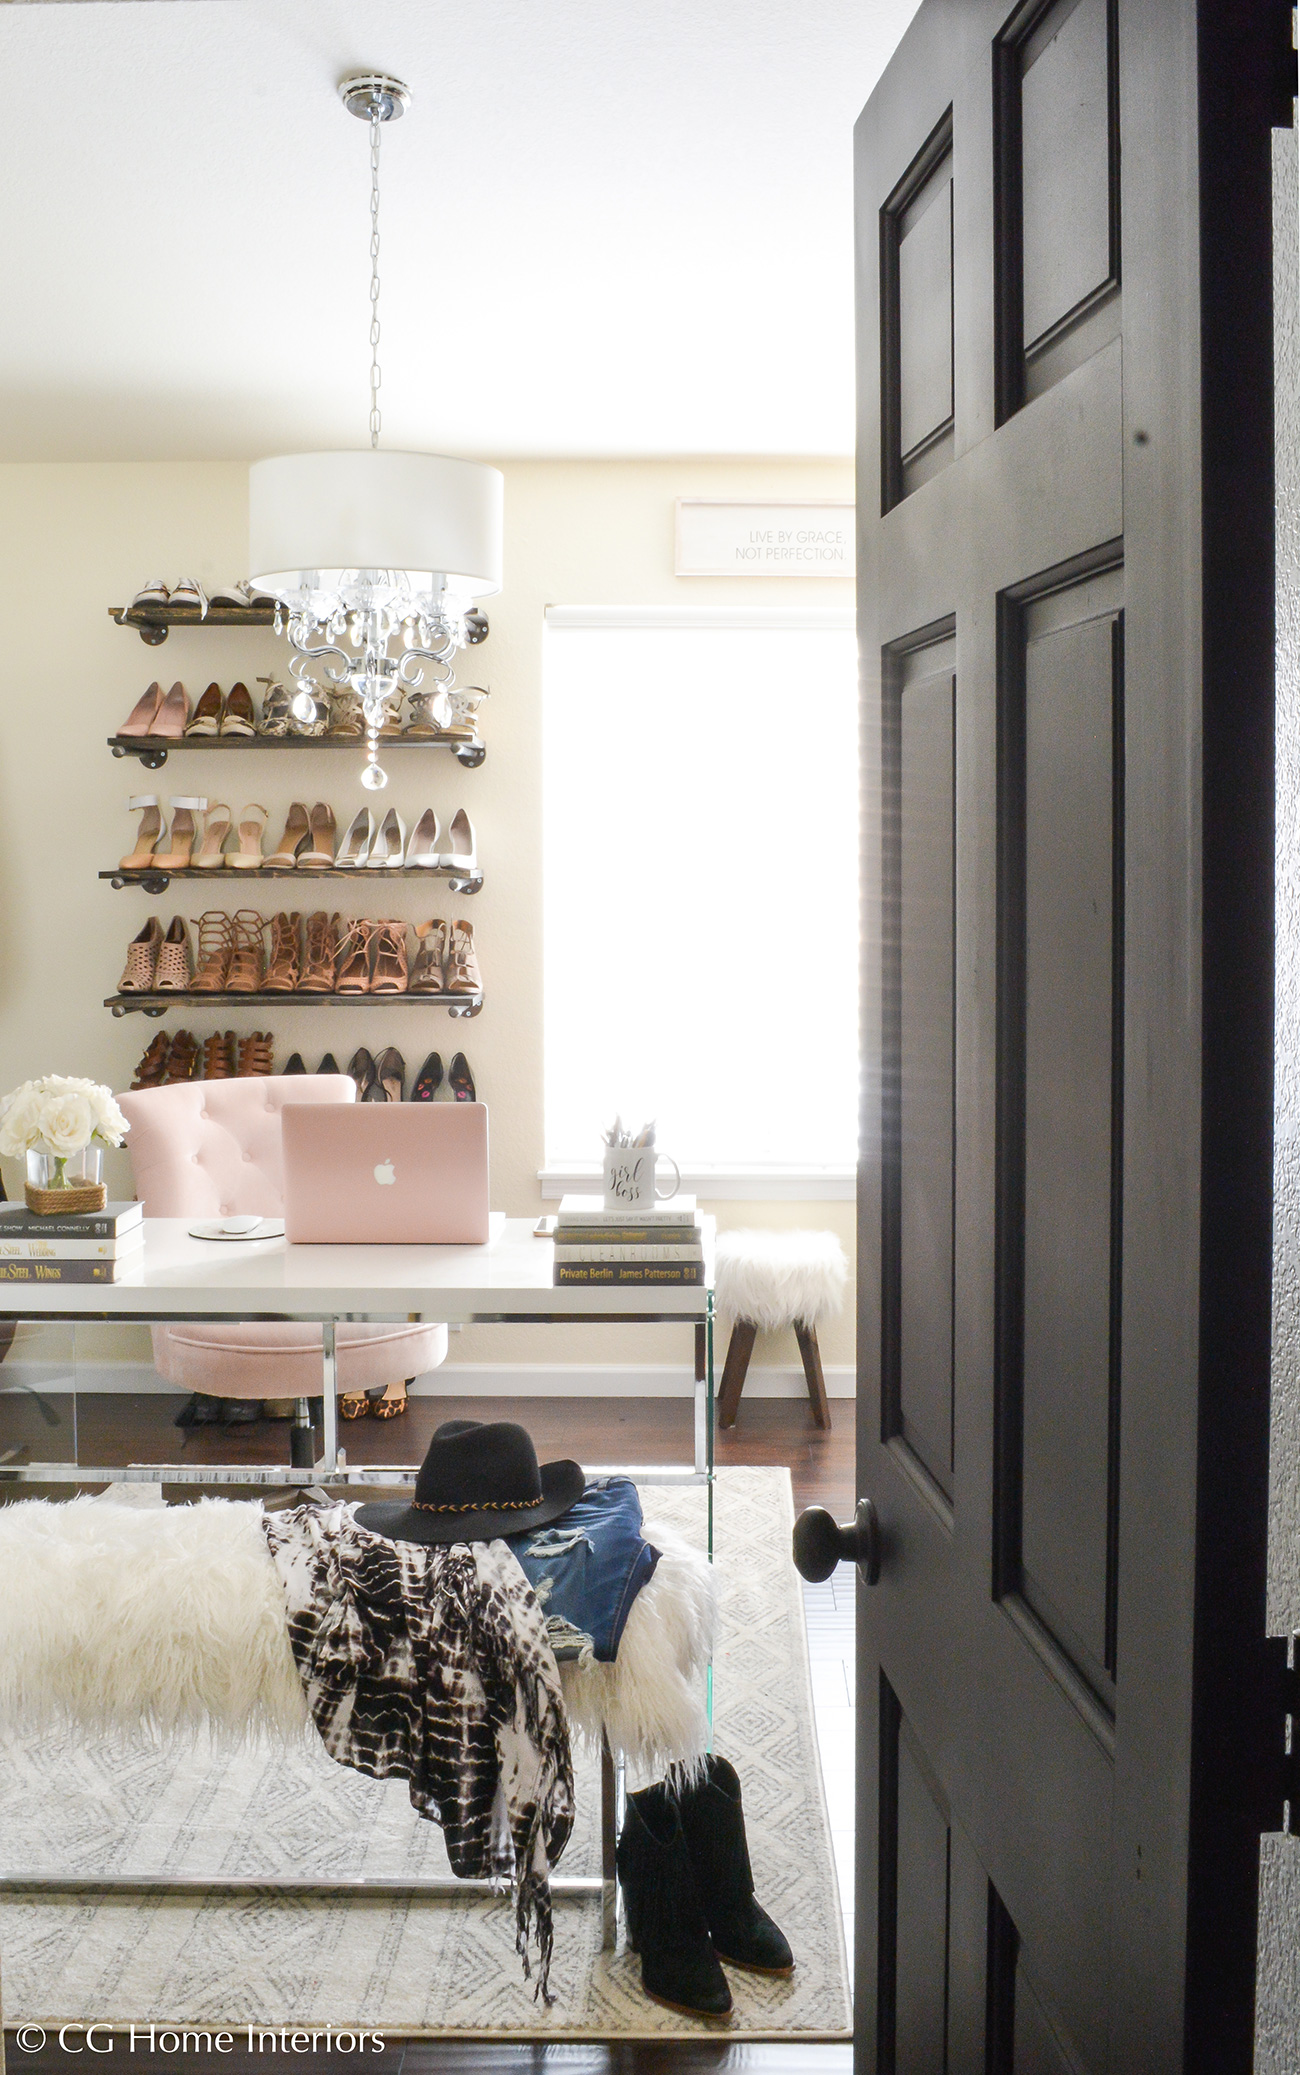 My Interior Paint Colors, Behr, Linen White